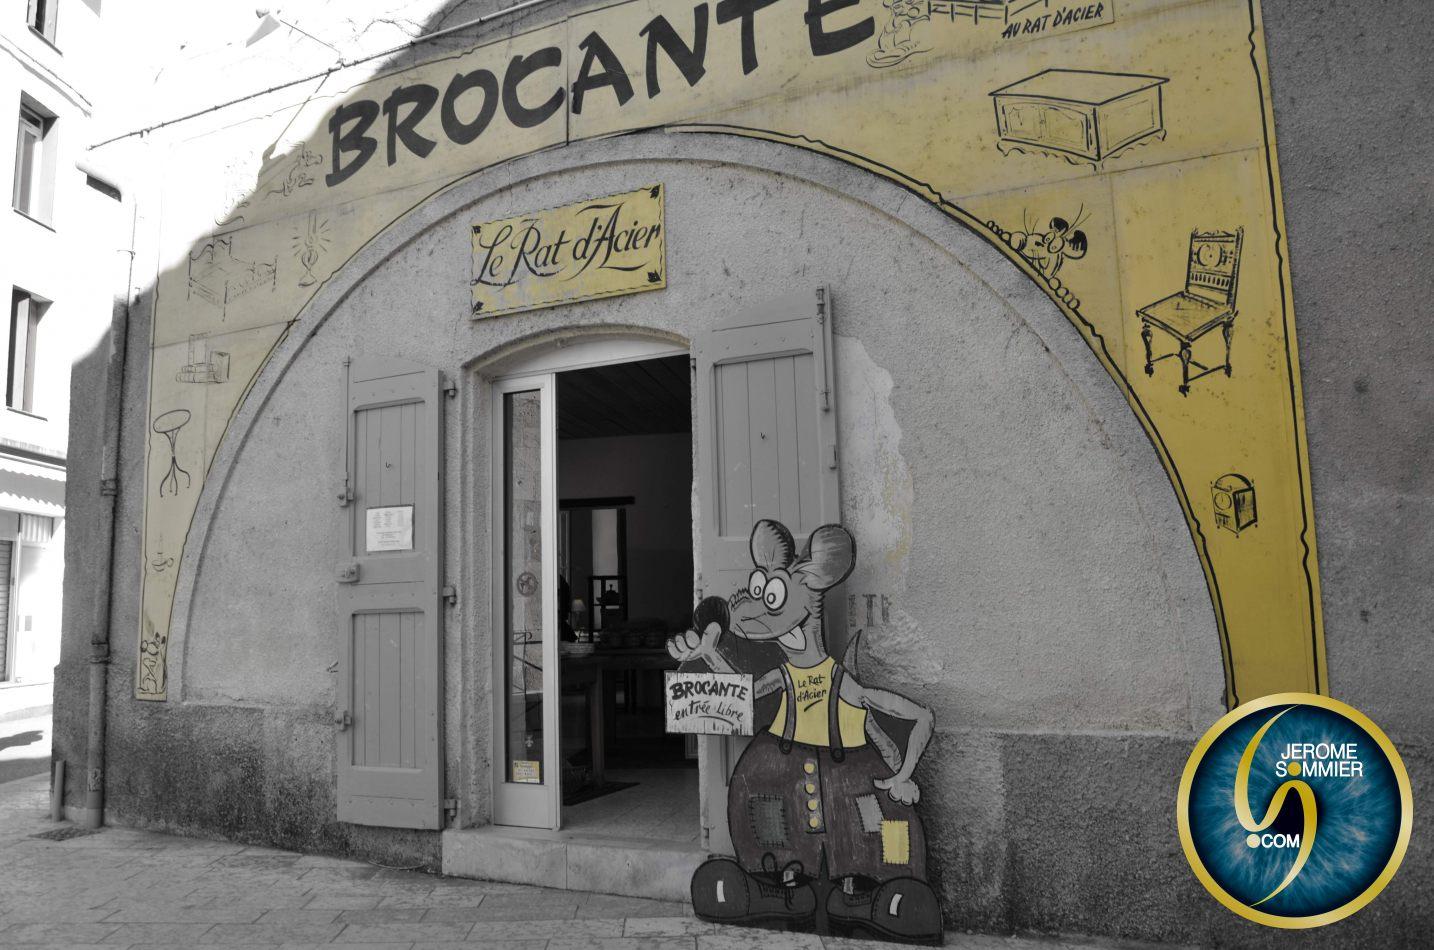 Jerome Sommier Photos - Photo & Graphism: St Jean du Gard